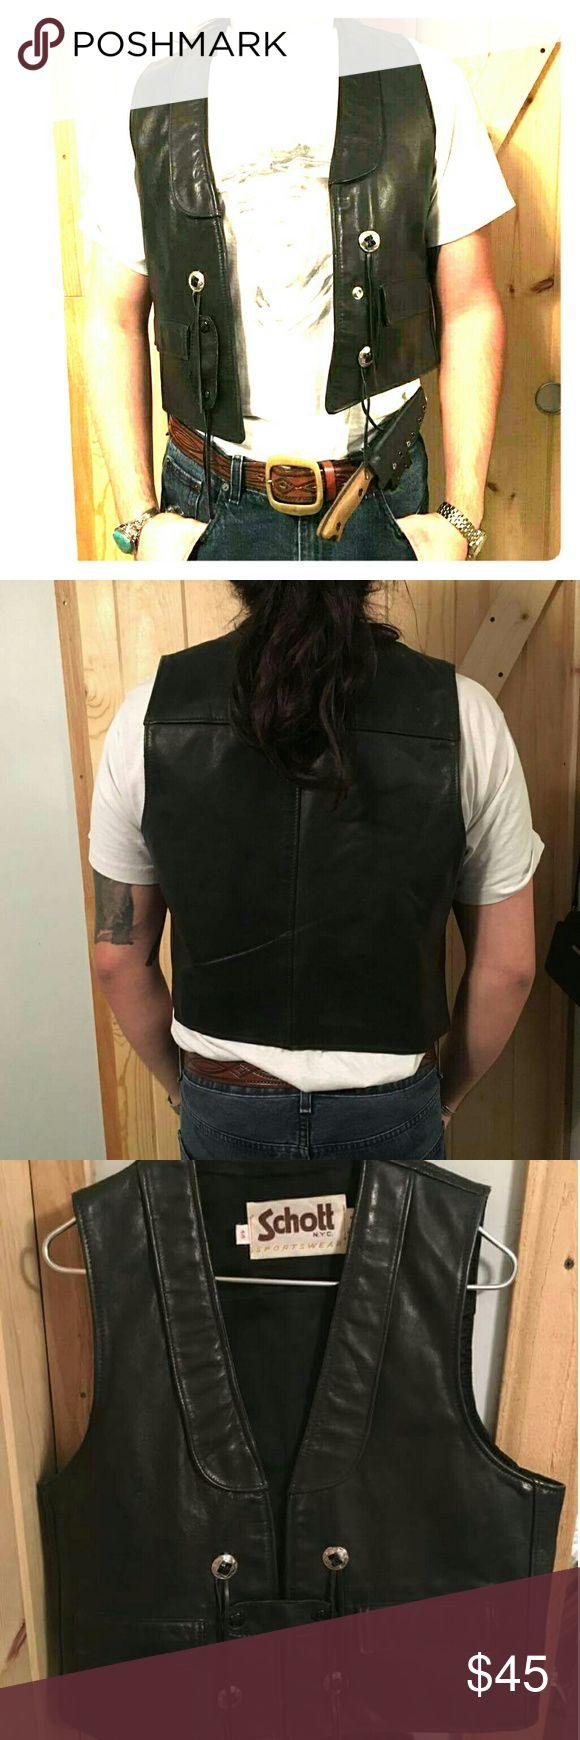 Schott Leather Vest Vintage Leather Schott Vest, in used condition with added character! Schott Jackets & Coats Vests